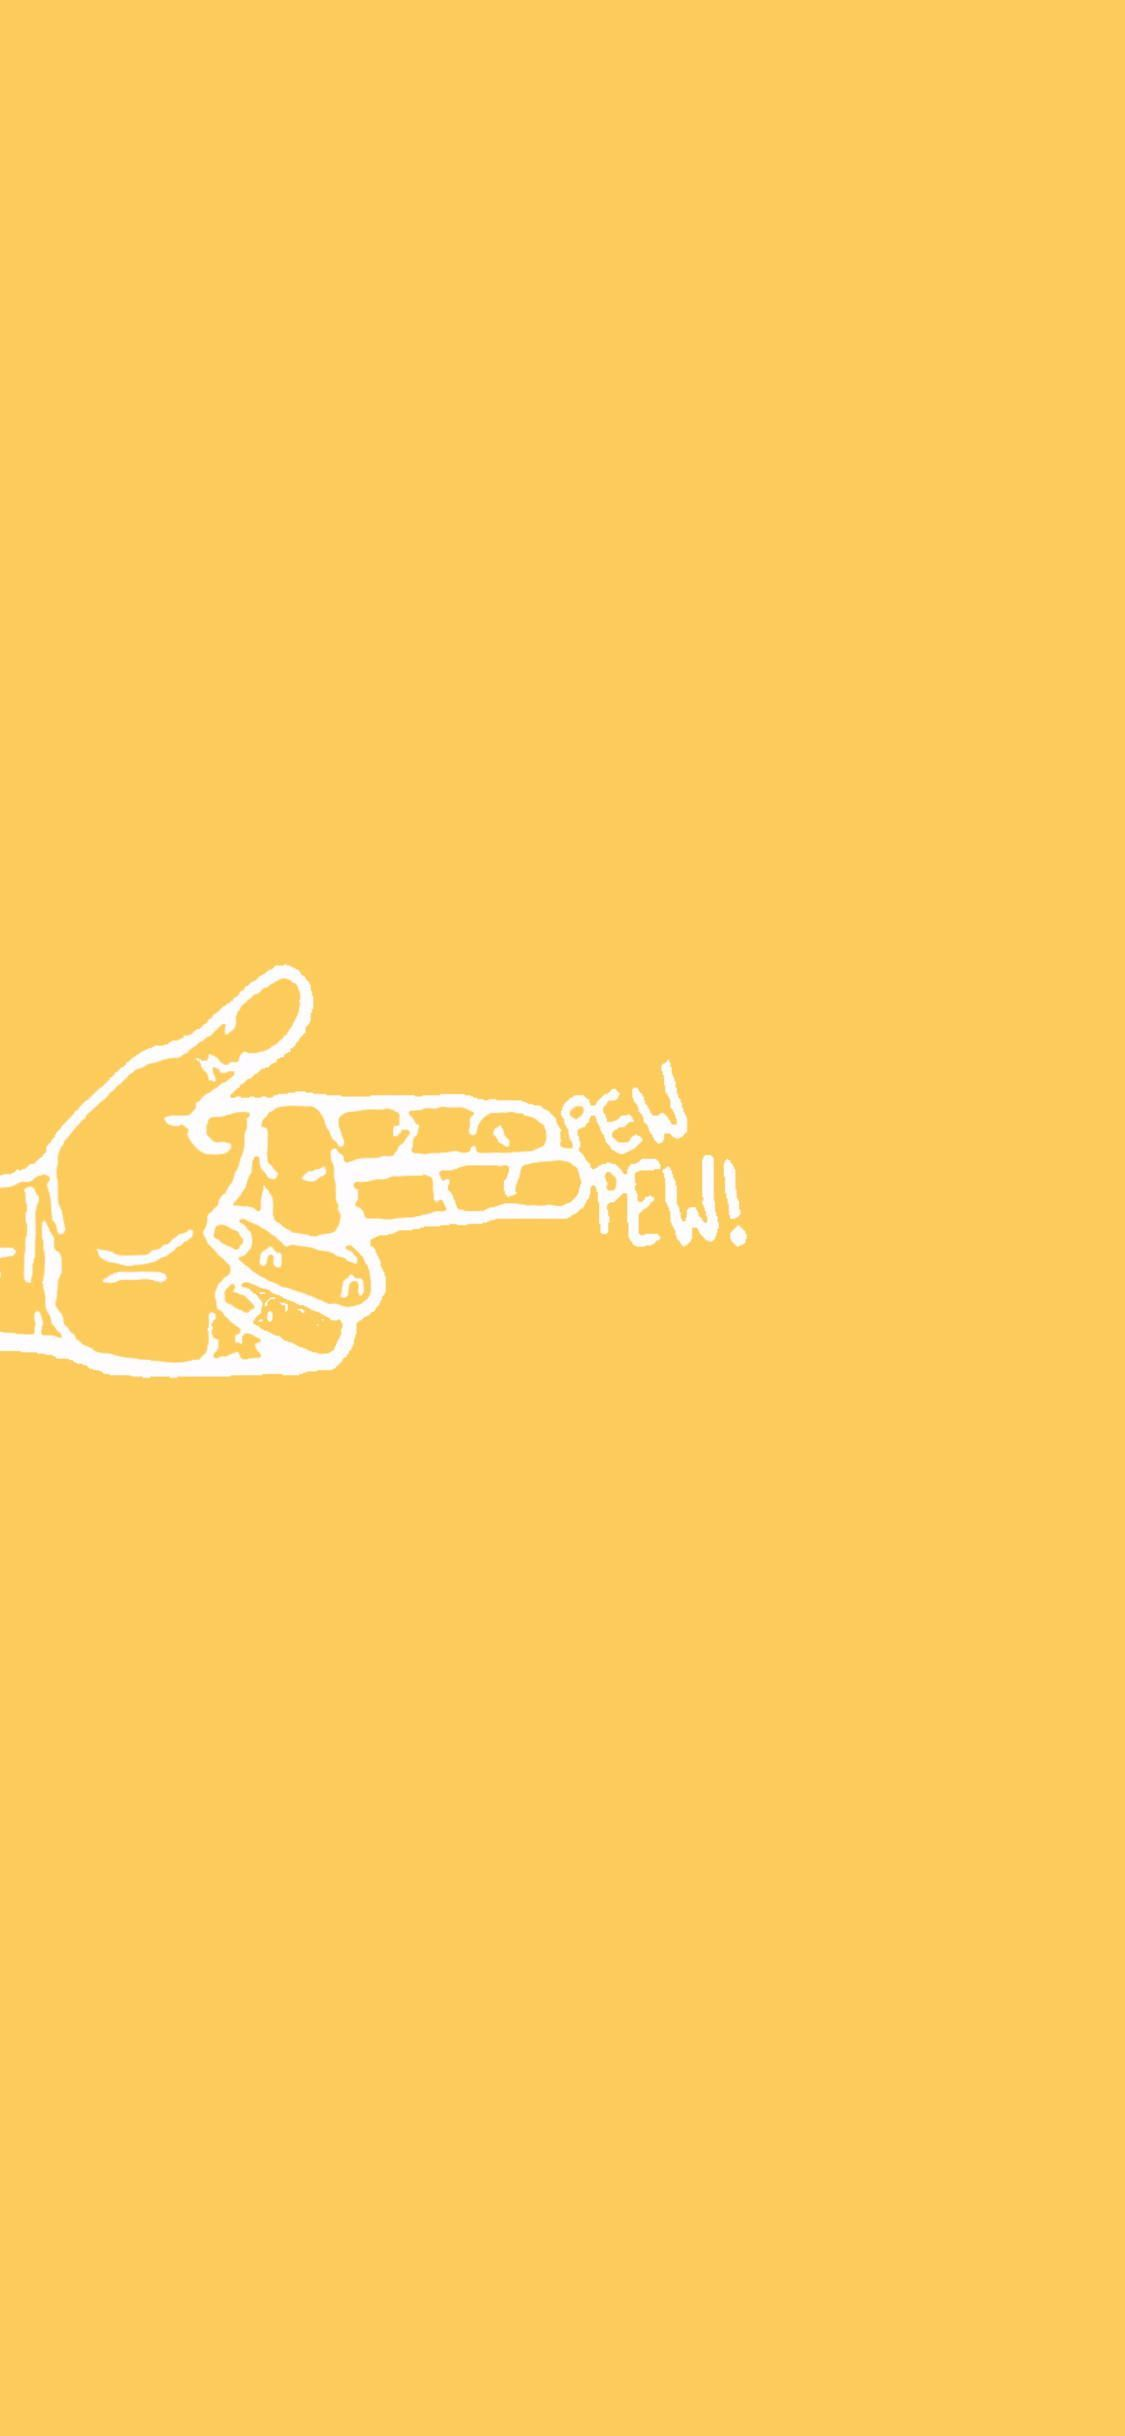 35 Yellow Aesthetic Wallpaper